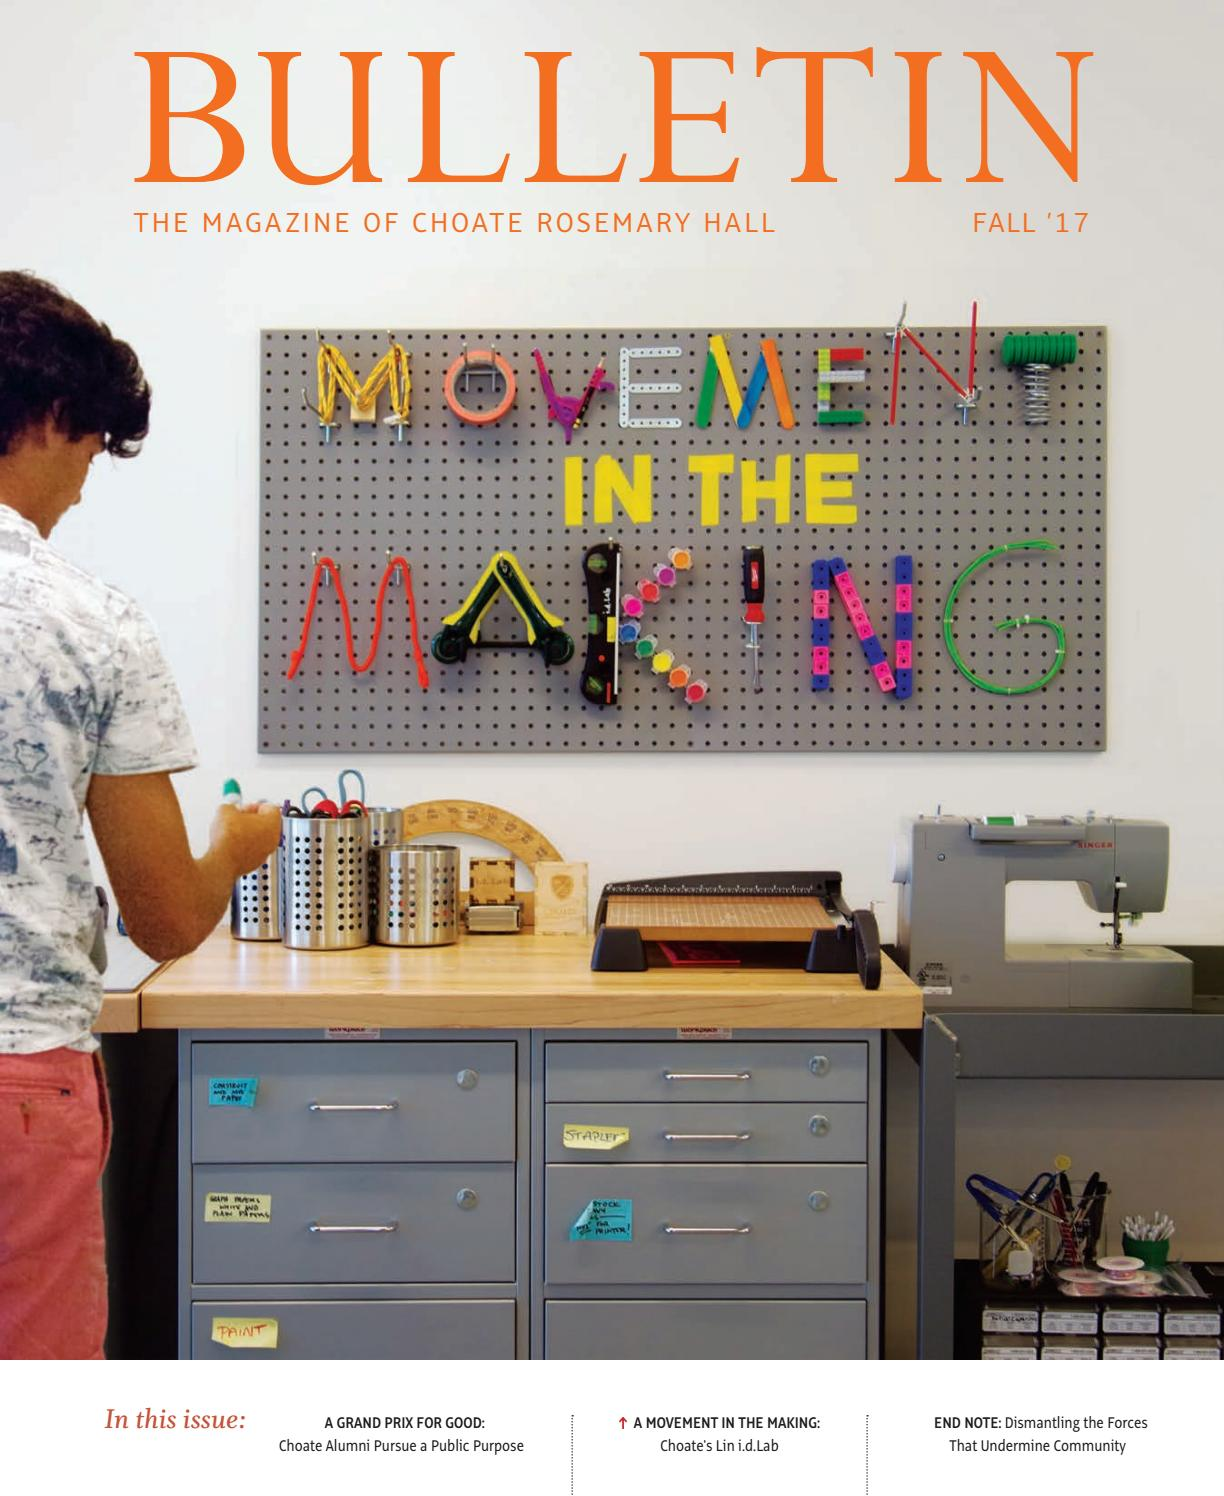 Choate Rosemary Hall Bulletin Fall 17 By Issuu Nan Ph Pro 3 800g